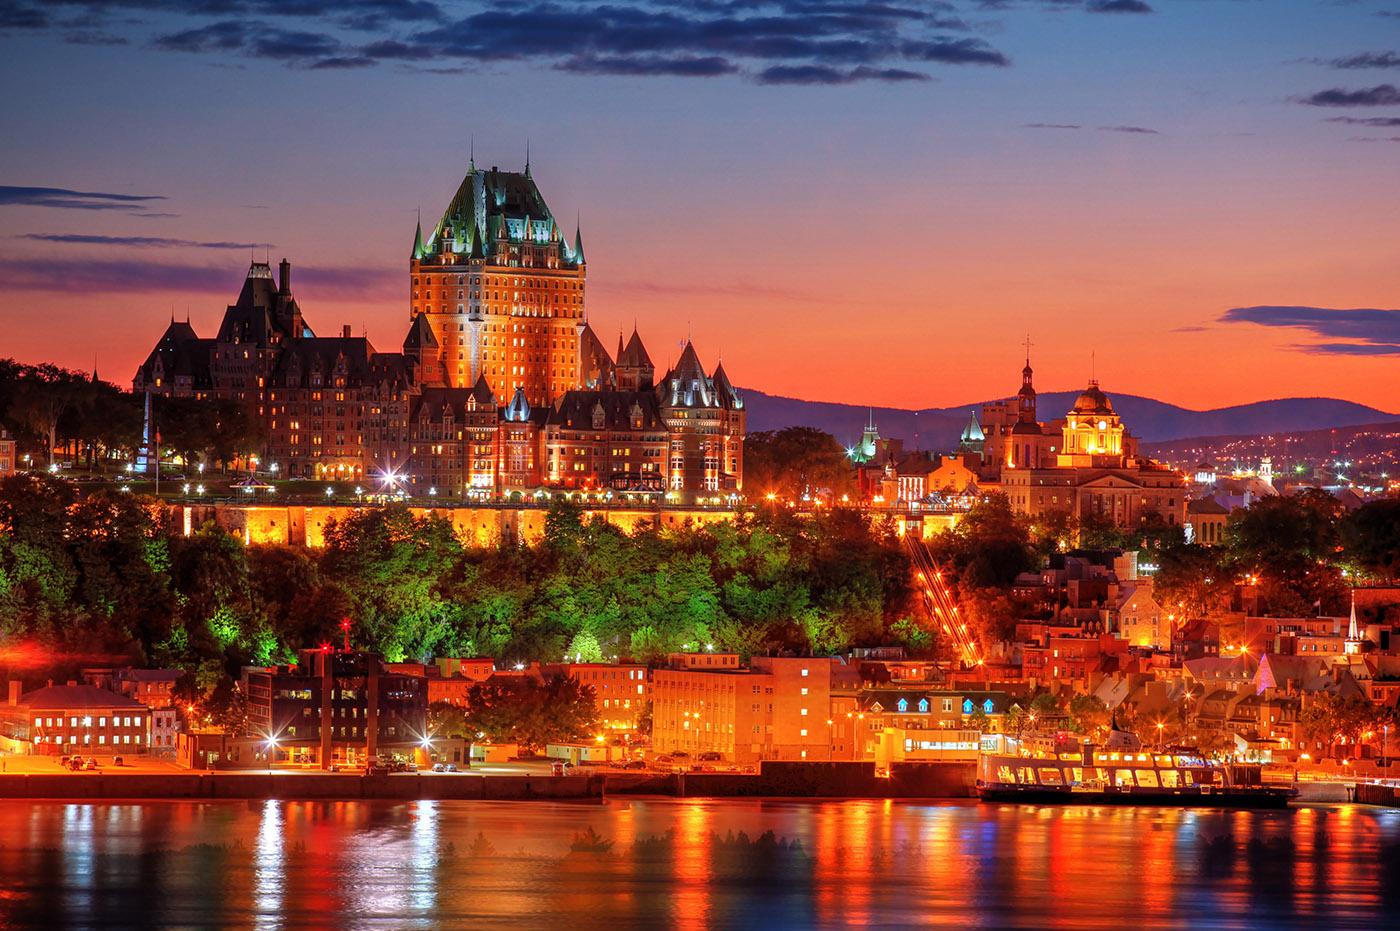 Quebec Frontenac Castle Montage 02 - RF Stock Image